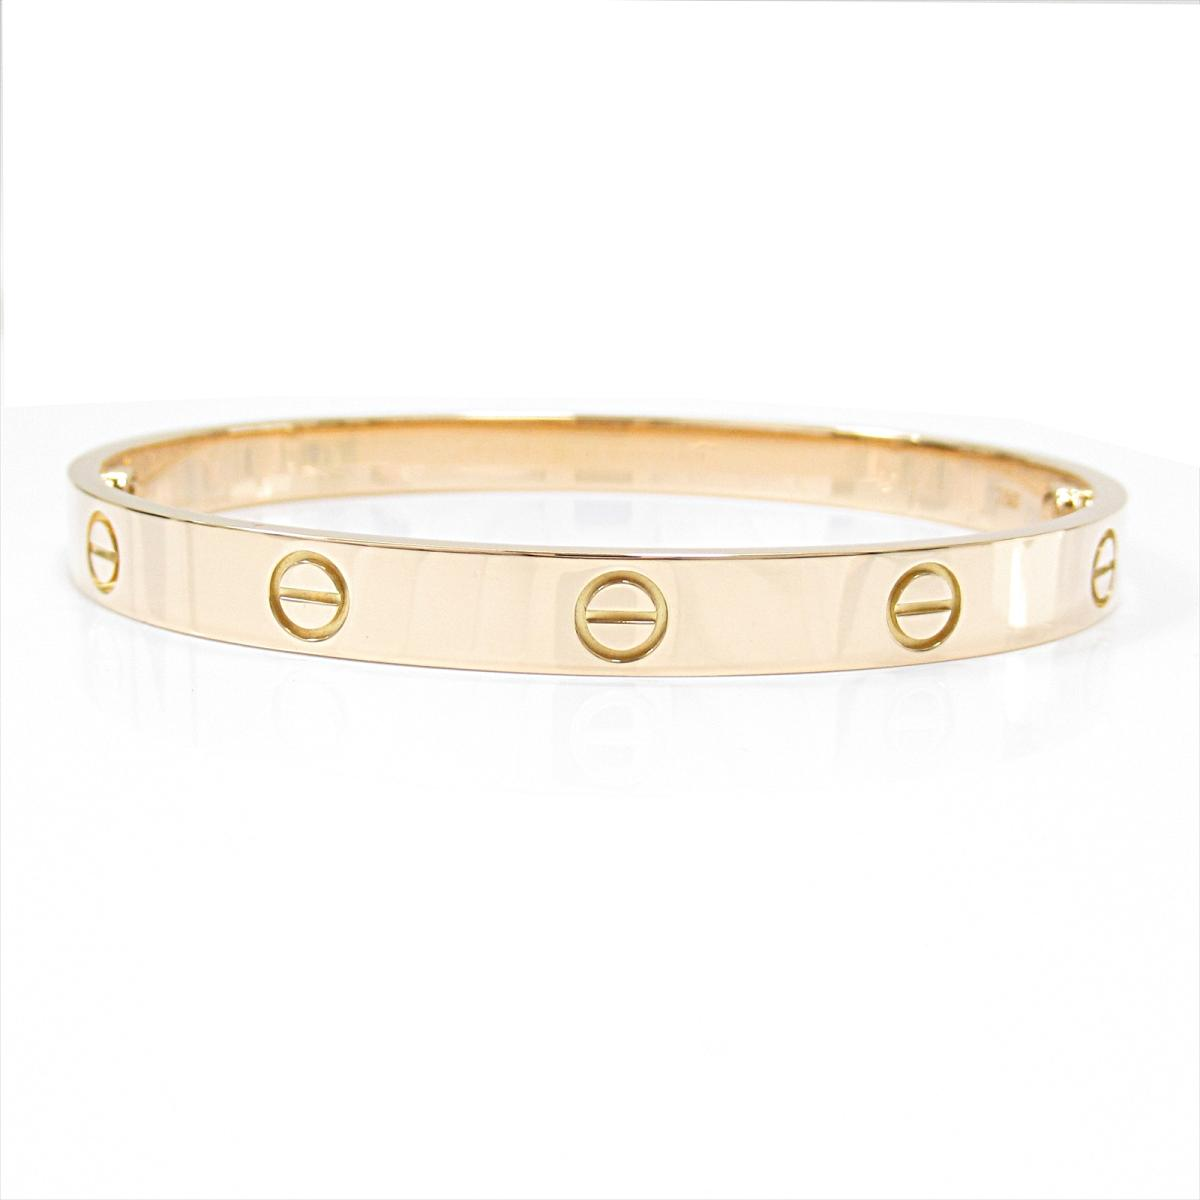 75fd497107242 BRANDOFF GINZA: Auth Cartier Love breath bracelet 18KYG (750) Yellow ...